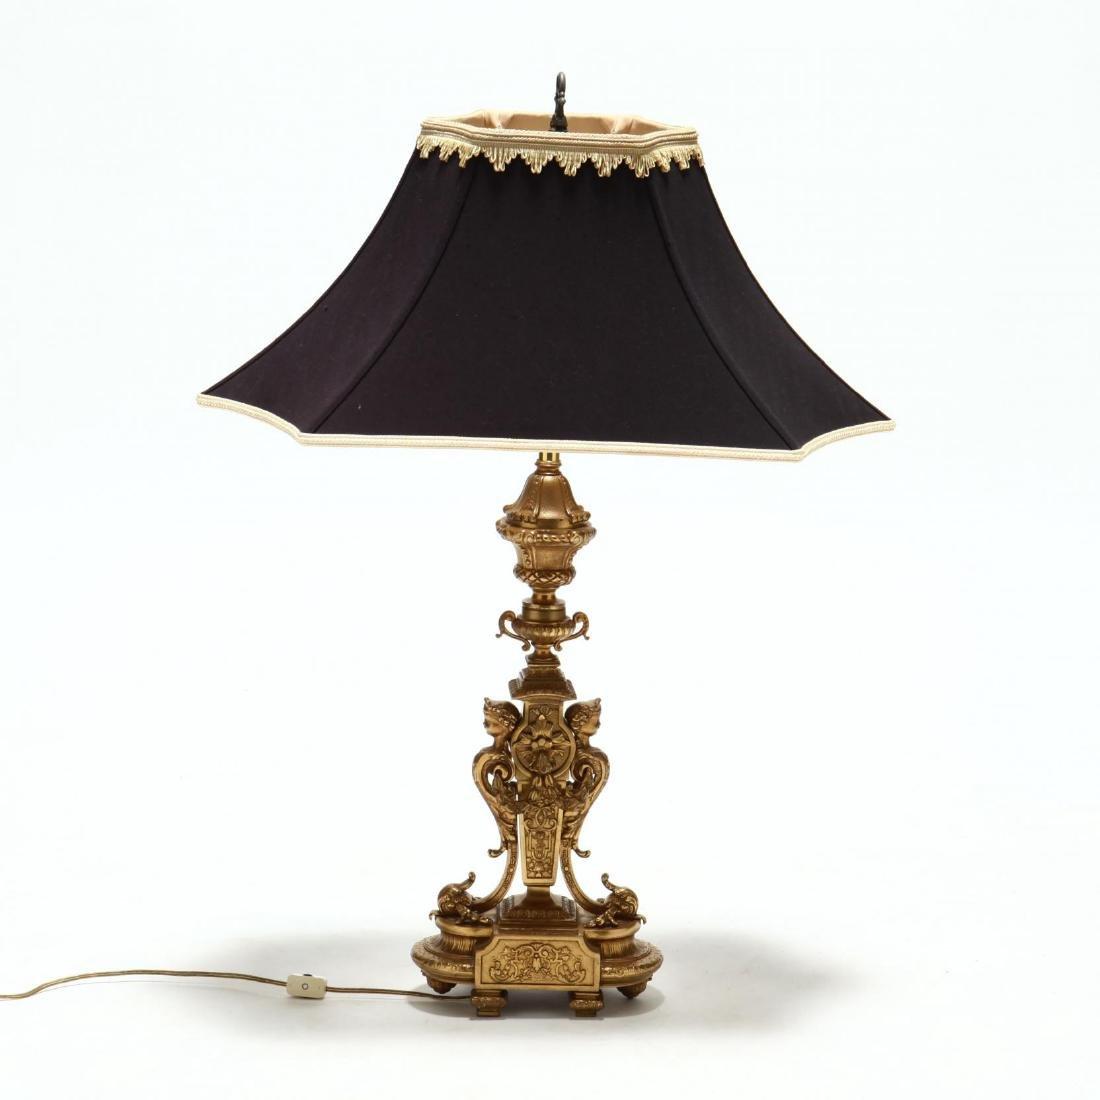 Marbro Lamp Co., Italian Renaissance Style Table Lamp - 2